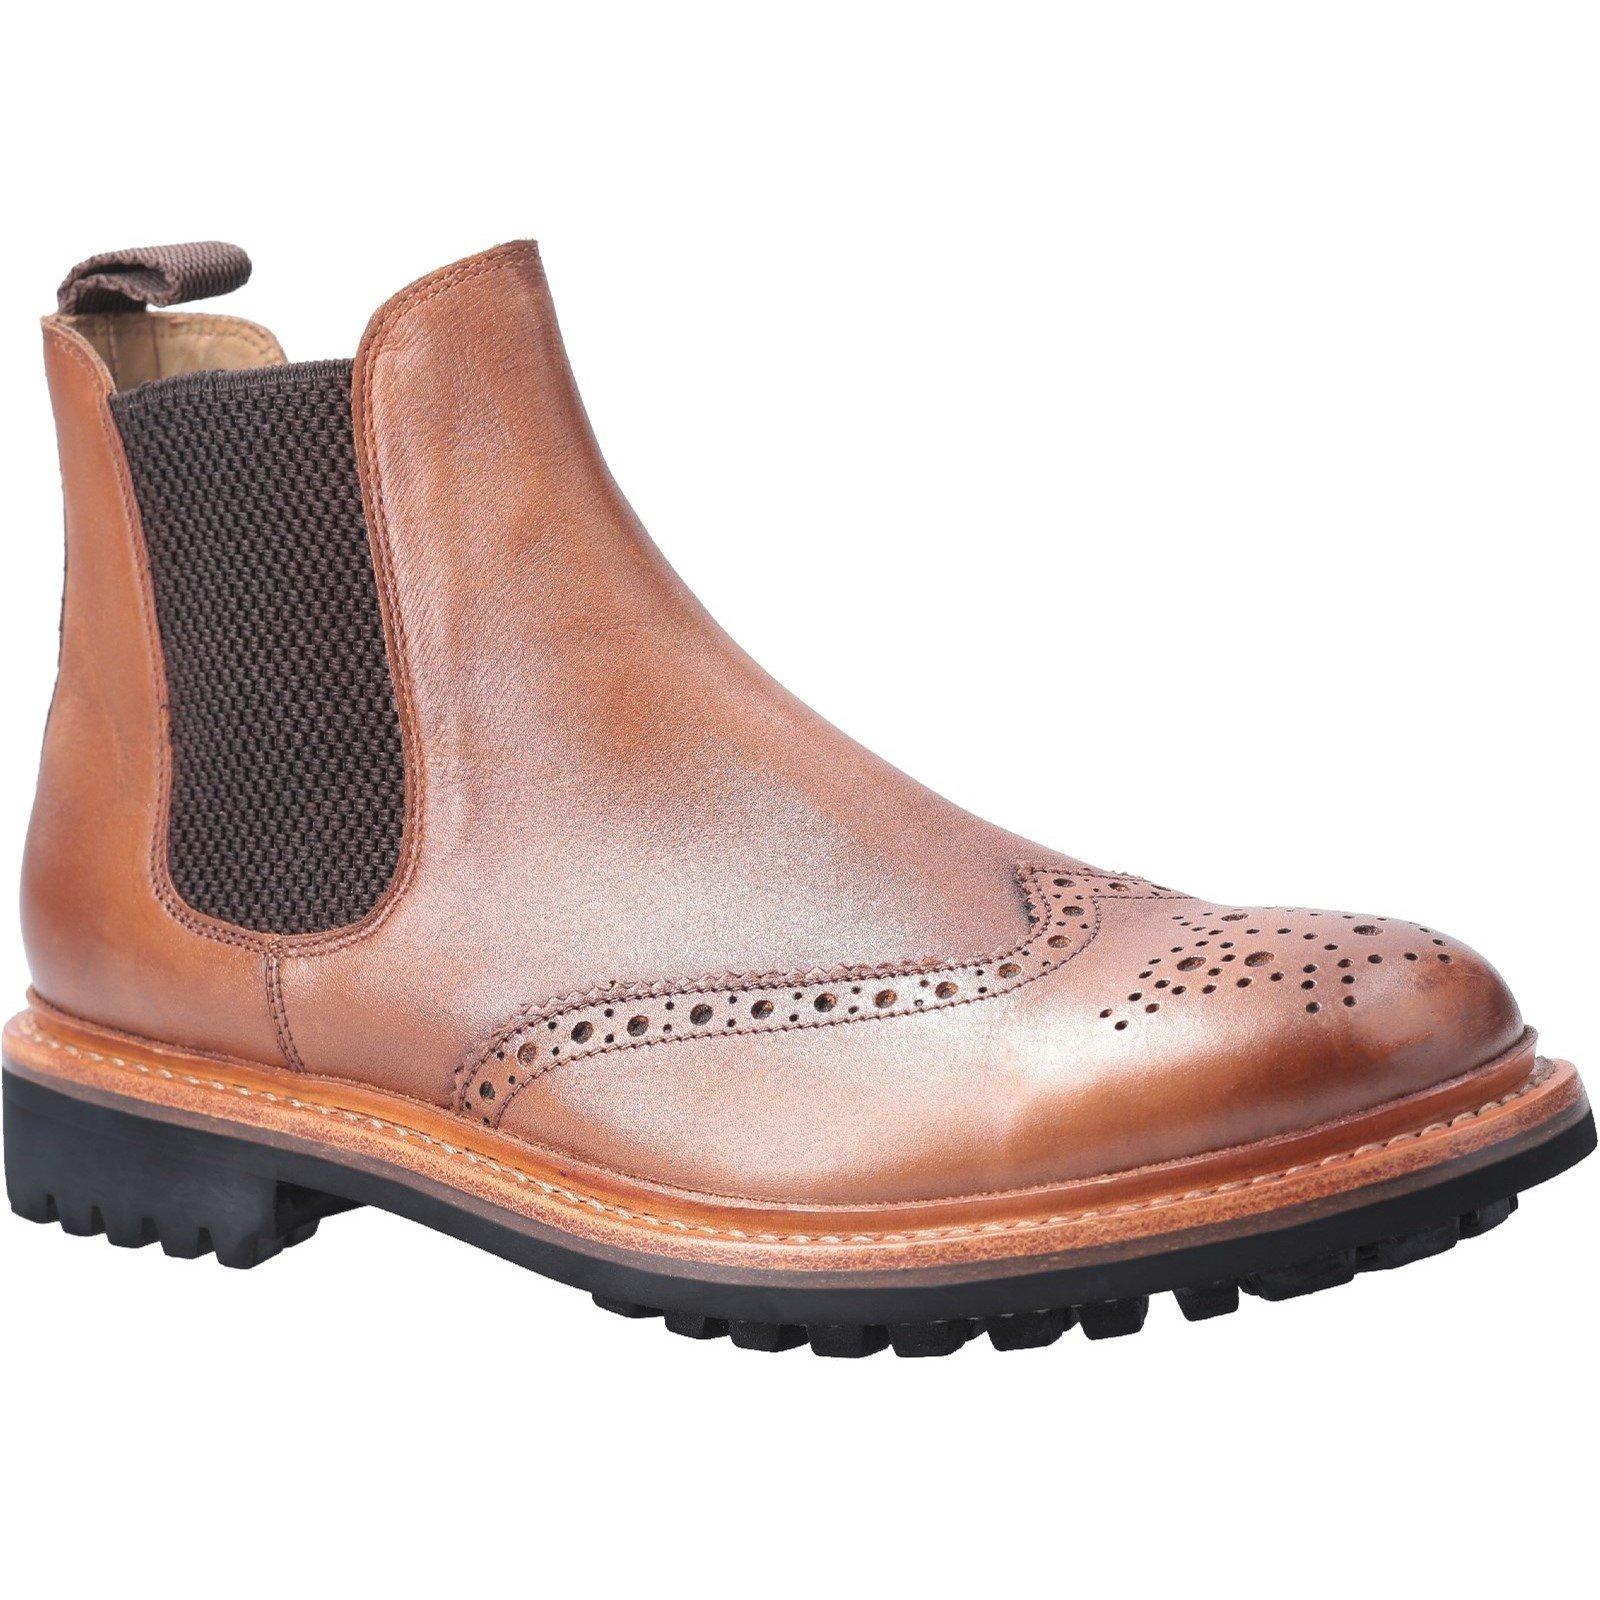 Cotswold Men's Siddington Commando Goodyear Welt Boot Brown 29259 - Brown 11